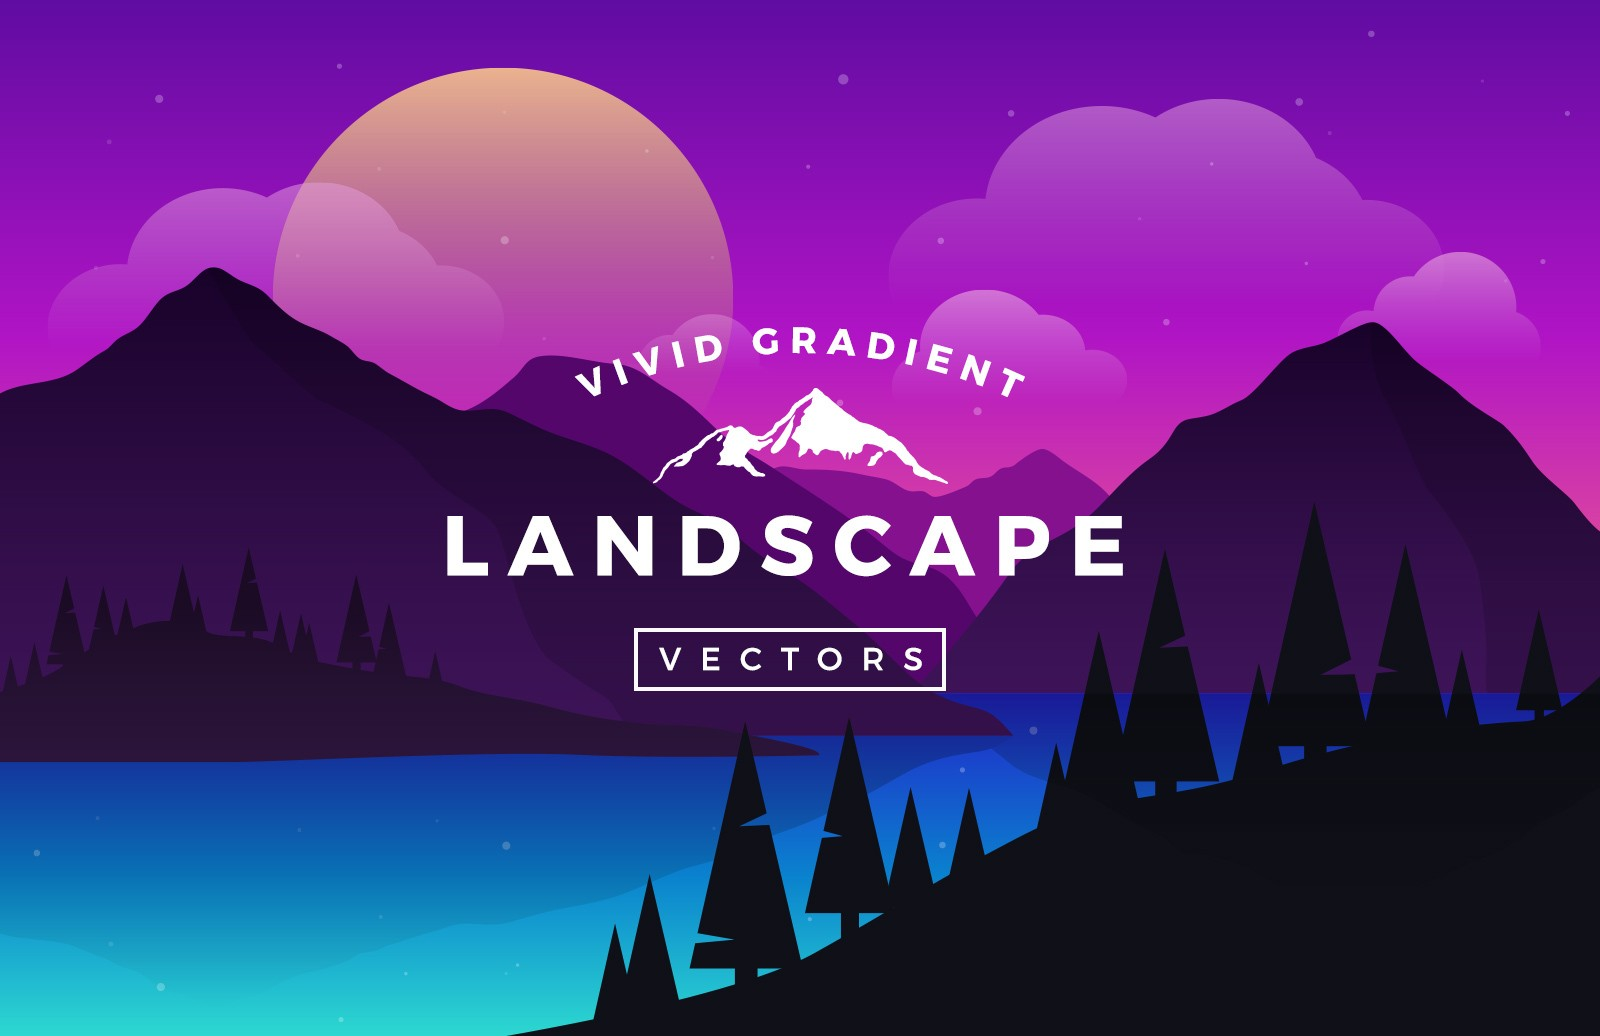 graphic royalty free Vector landscapes. Vivid gradient